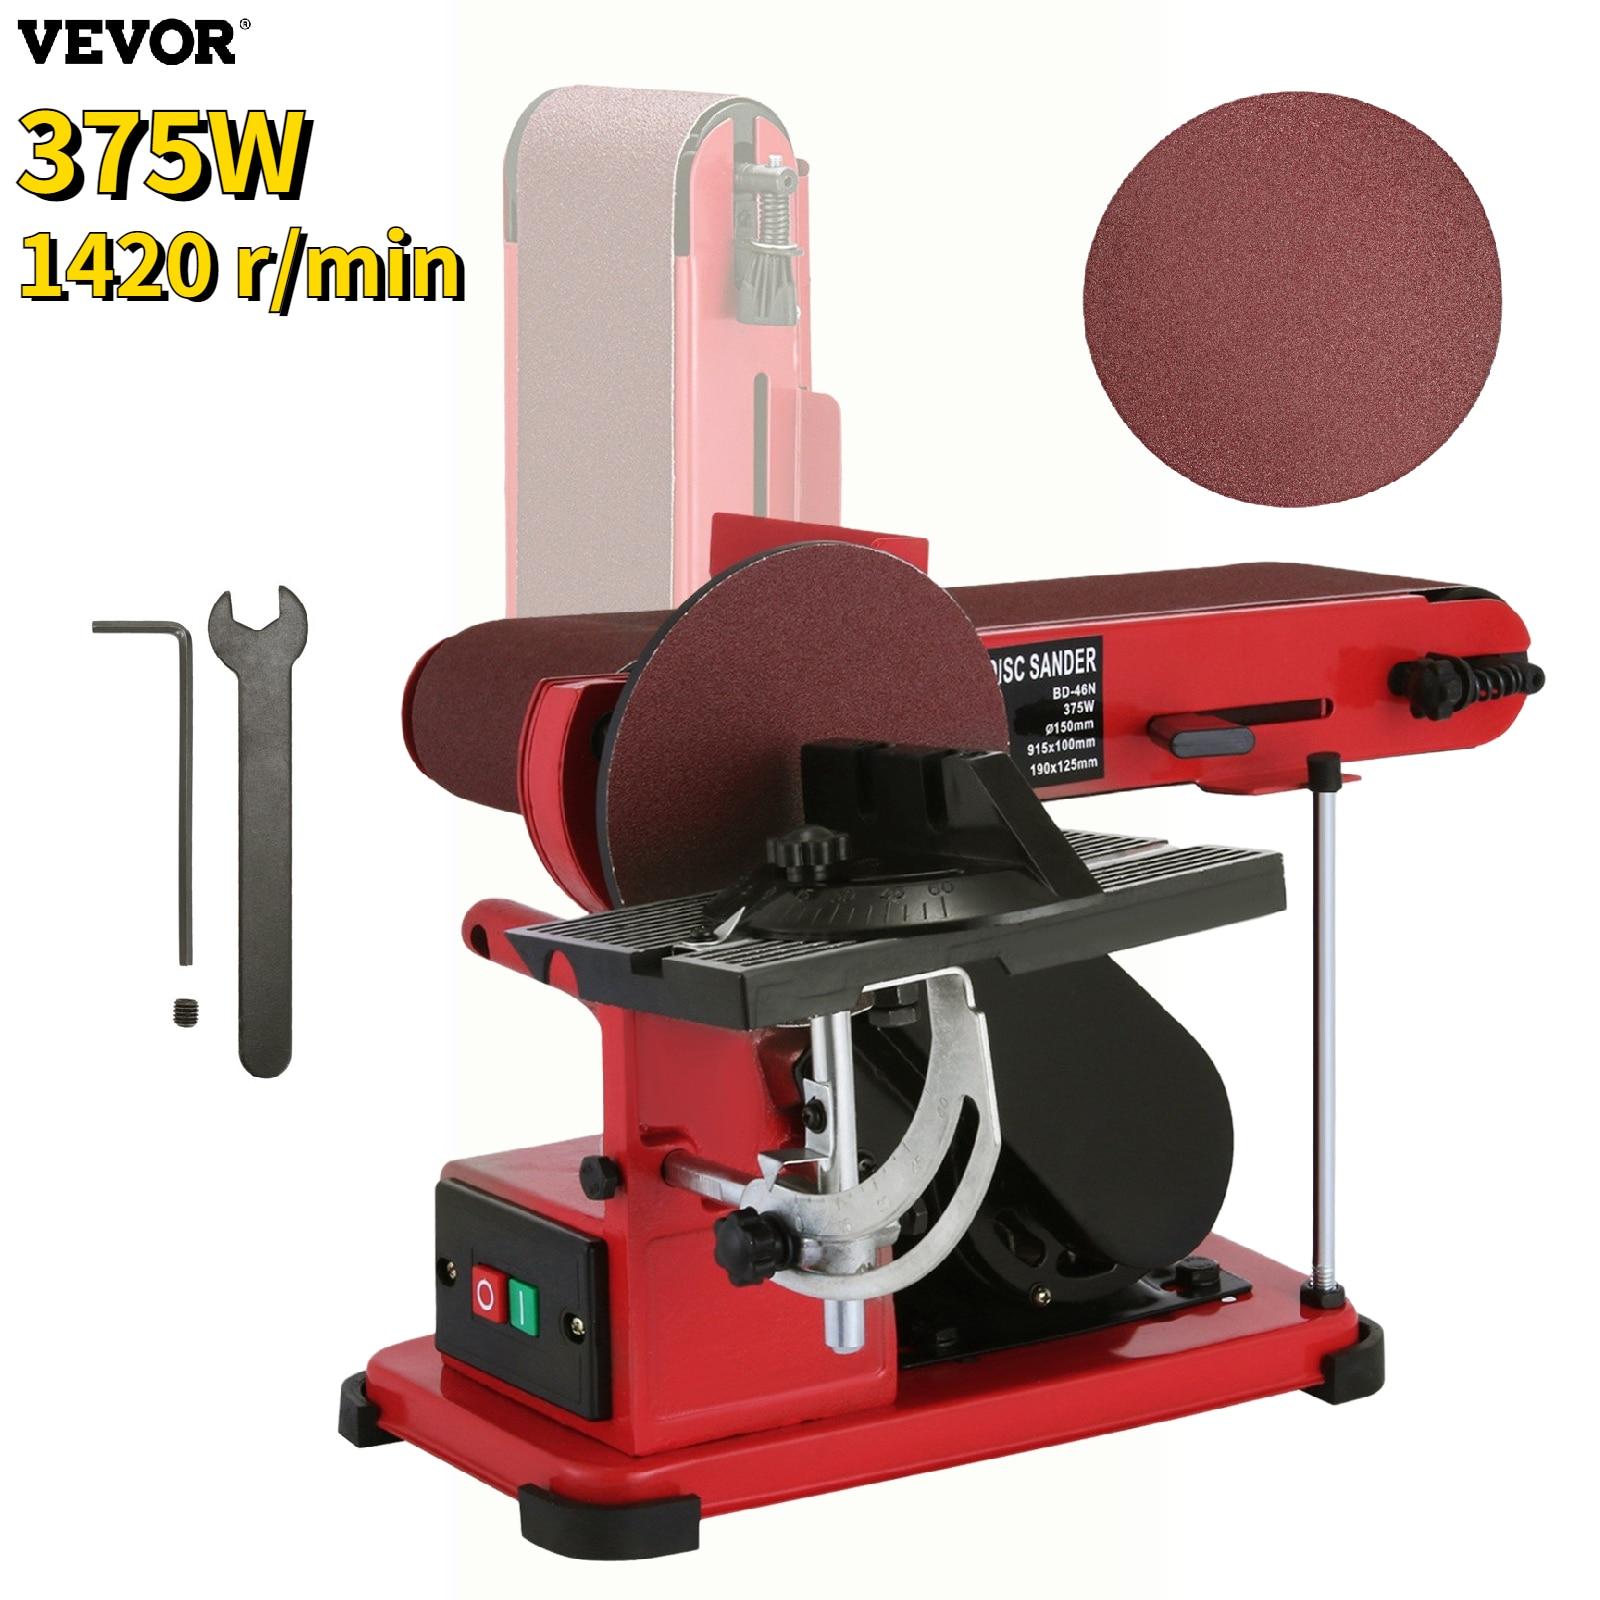 VEVOR 375 واط متعددة الوظائف جلخ الرملي آلة سطح المكتب حزام القرص ساندر اليدوية النجارة طحن تلميع أدوات كهربائية